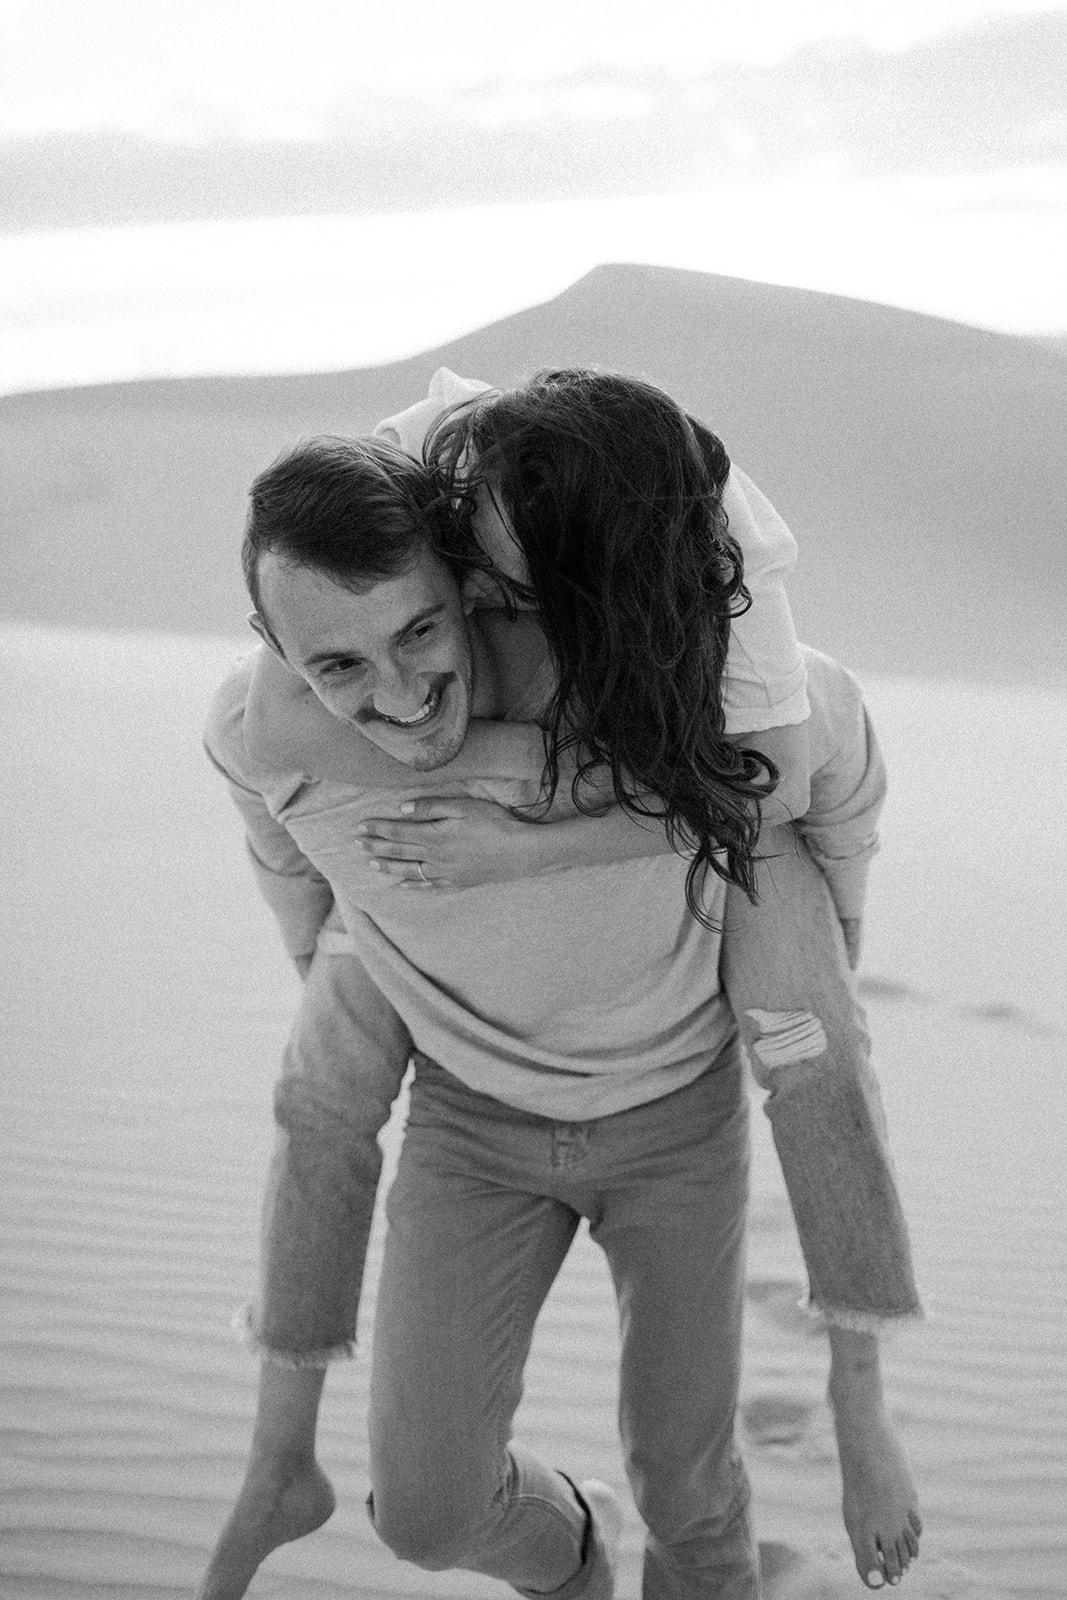 Imperial_Sand_Dunes_Linda_and_Sam_Dawn_Charles_Photographer-29.jpg